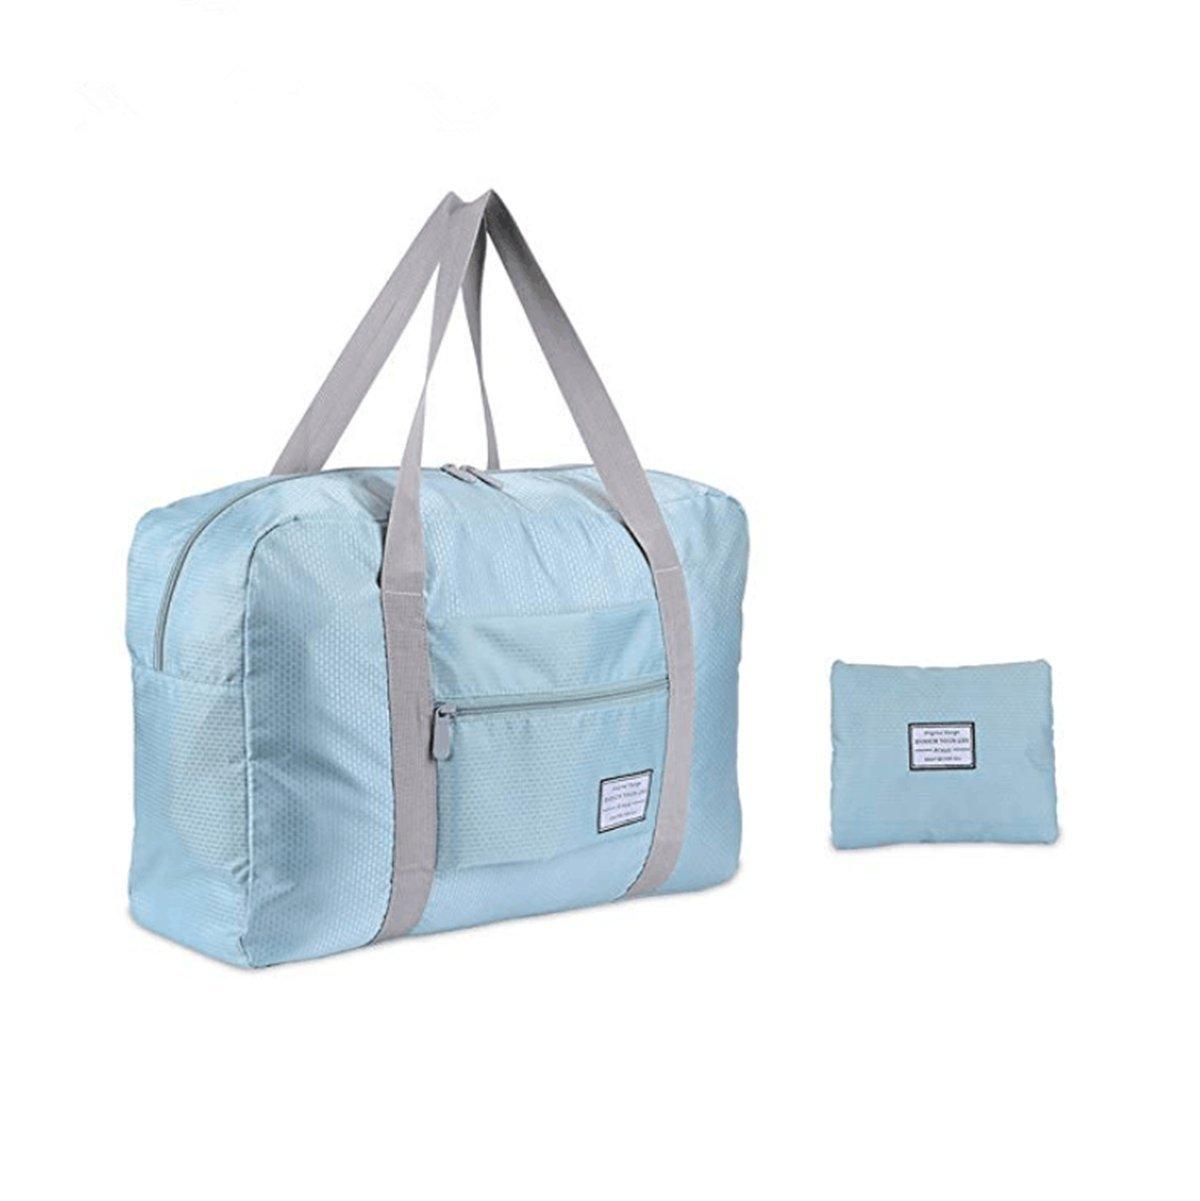 Foldable Travel Bag Waterproof Travel Duffel Bag Large Capacity Carry on Bag